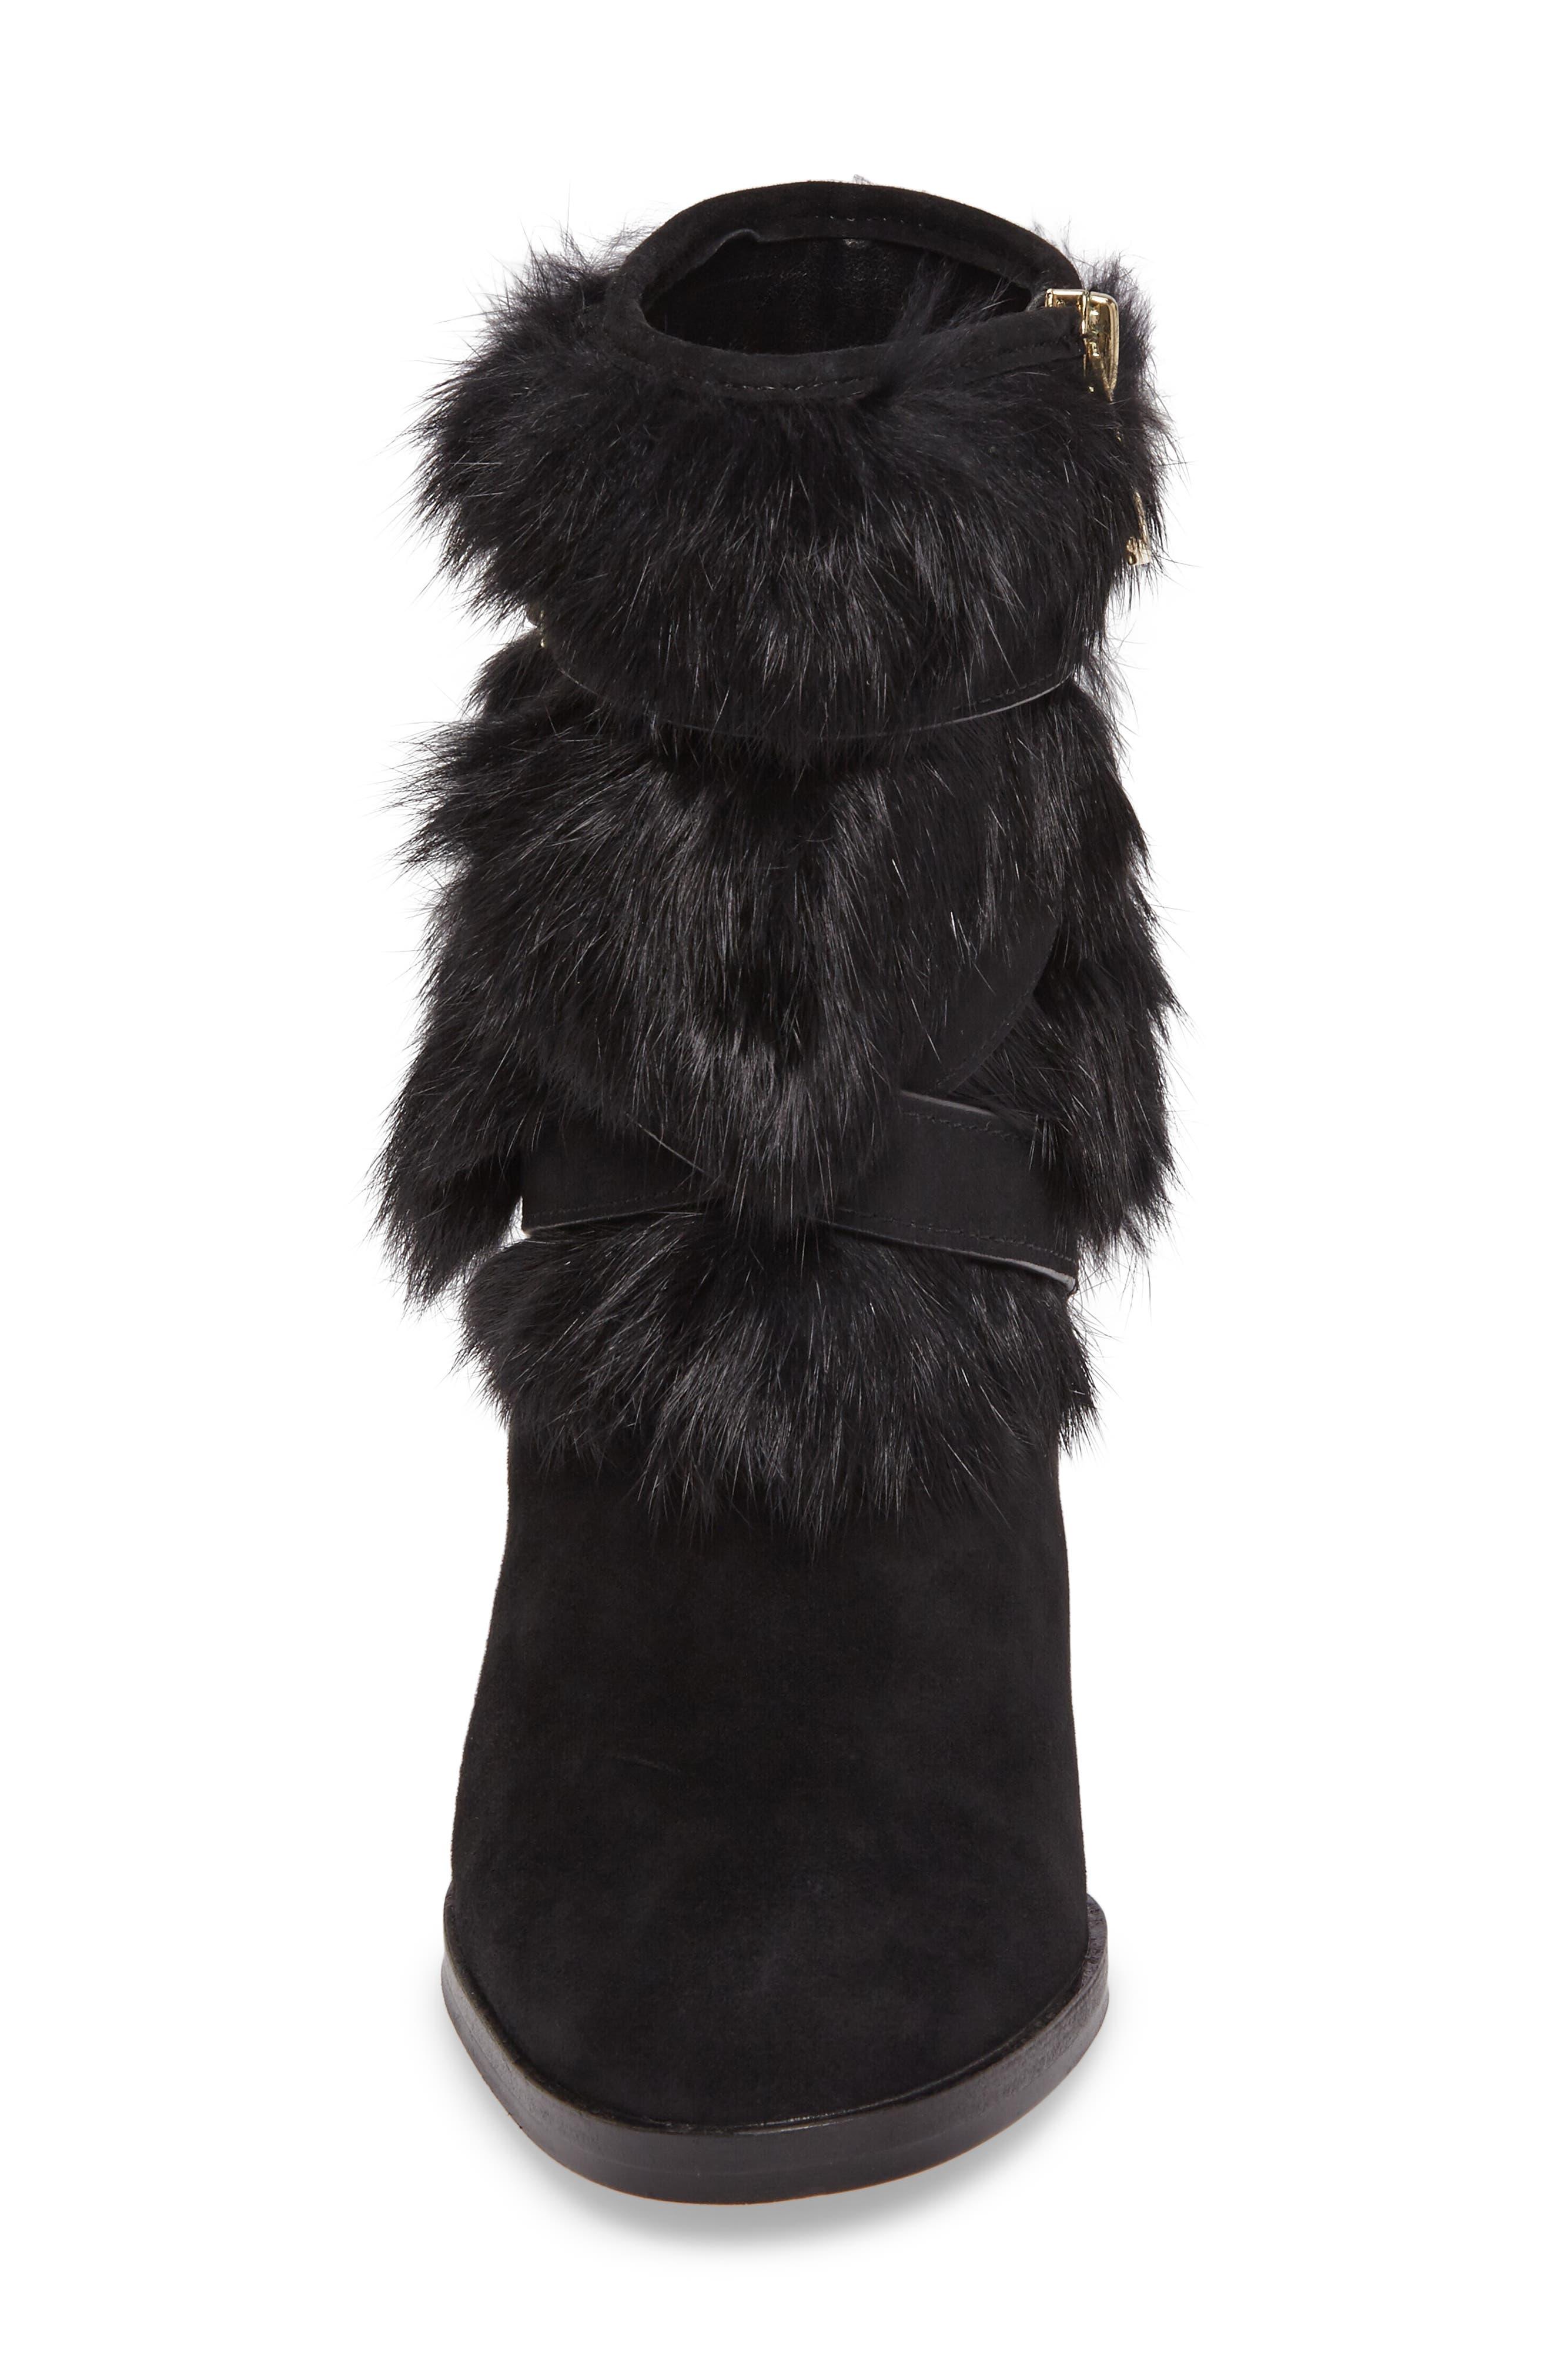 Yuma Genuine Rabbit Fur Bootie,                             Alternate thumbnail 4, color,                             001